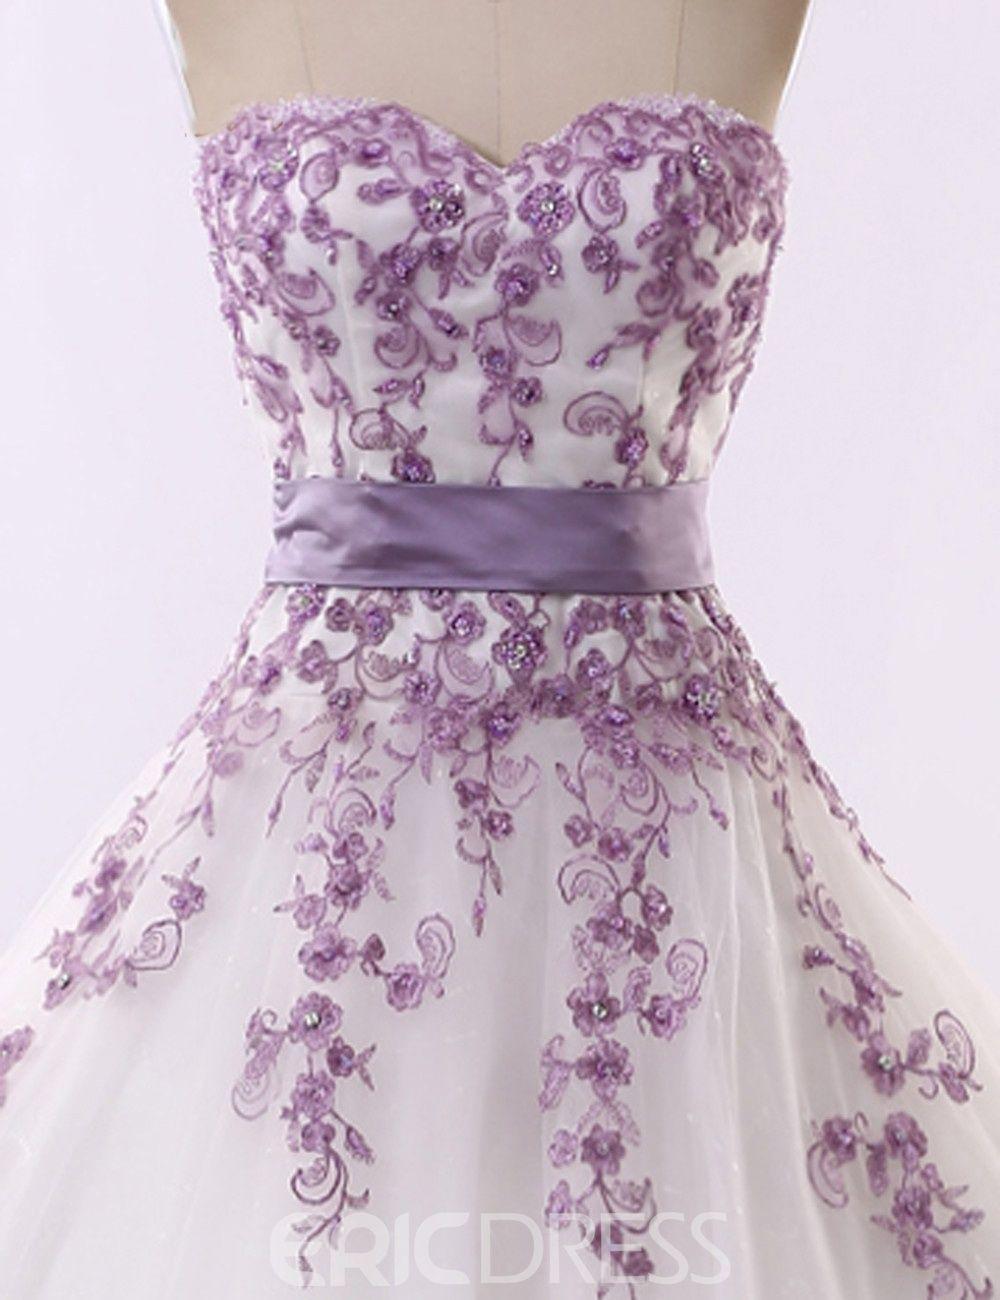 Ericdress Strapless Appliques Ball Gown Wedding Dress Purple Wedding Dress Ball Gown Wedding Dress Ball Gowns [ 1300 x 1000 Pixel ]